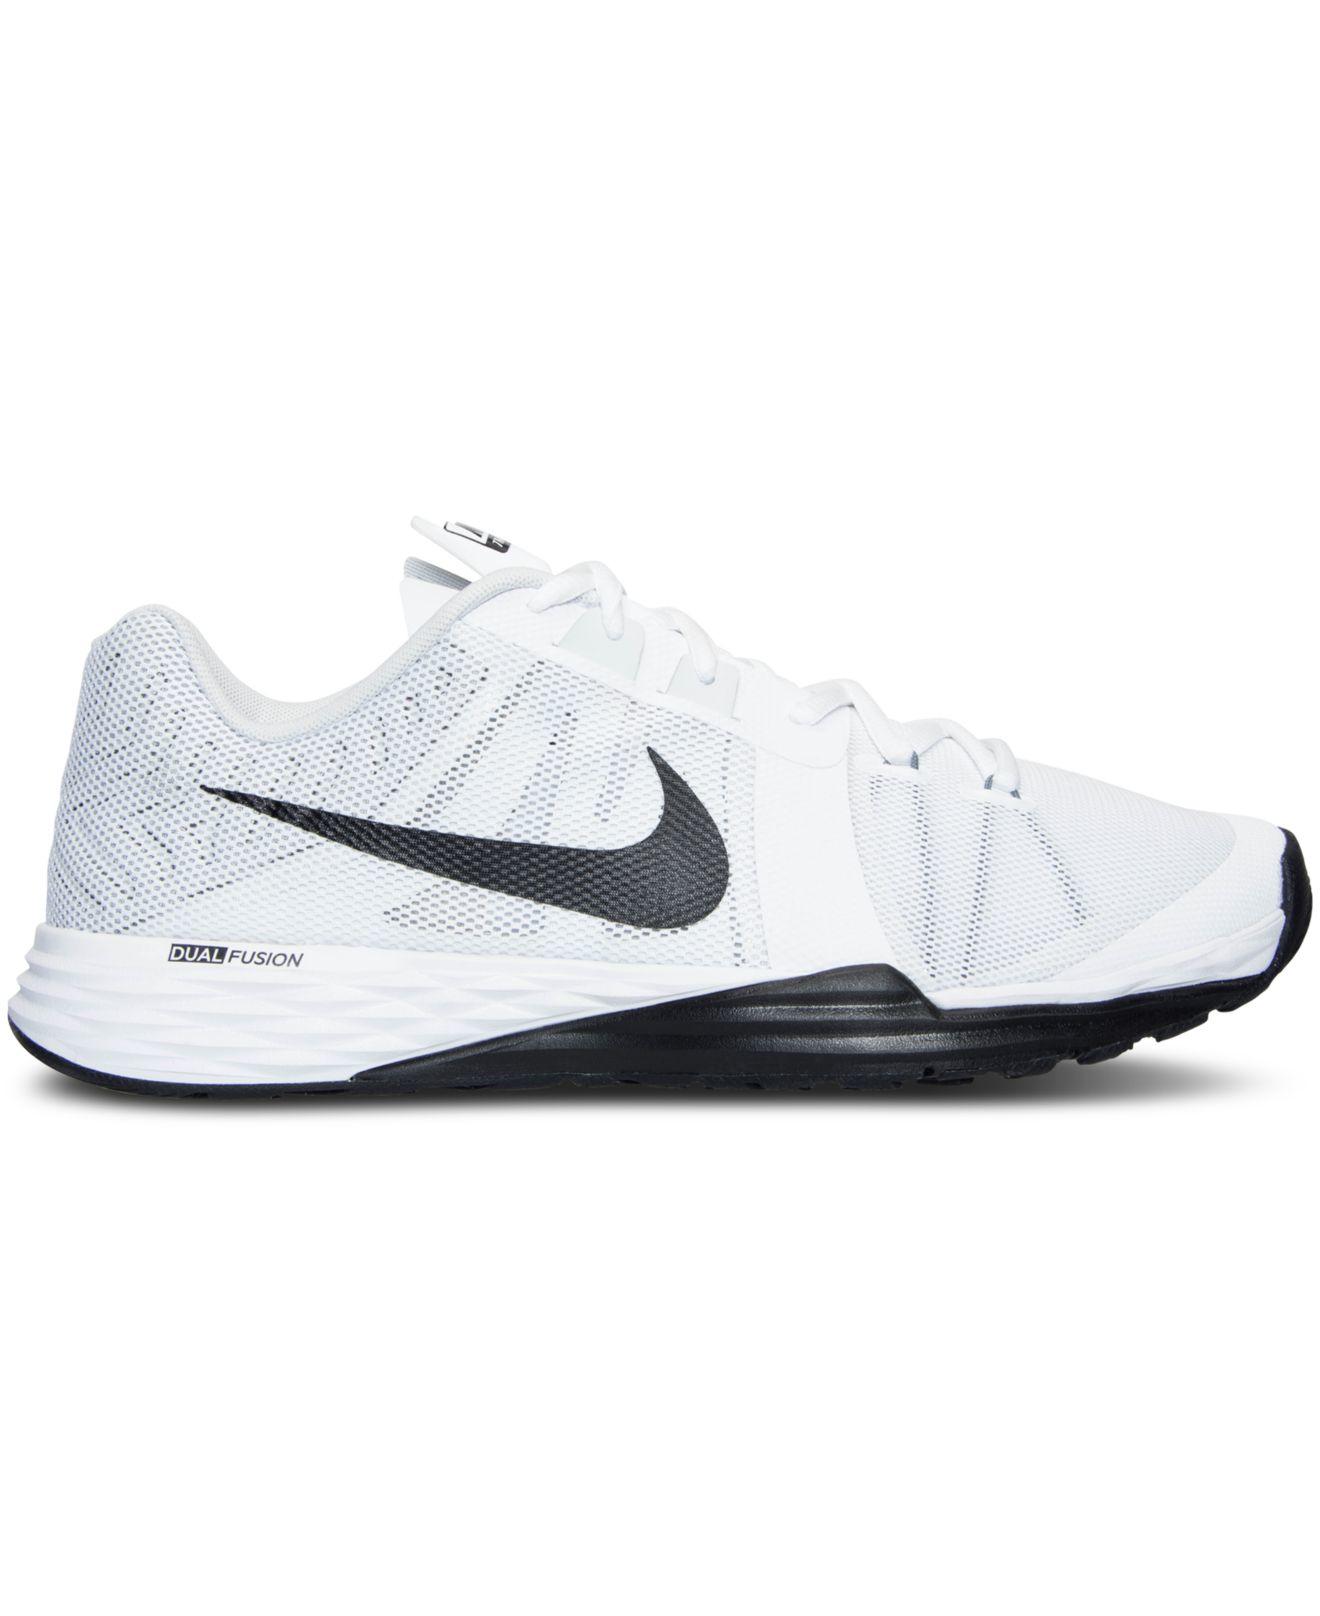 Lyst - Nike Men s Train Prime Iron Dual Fusion Training Sneakers ... 91900d49d